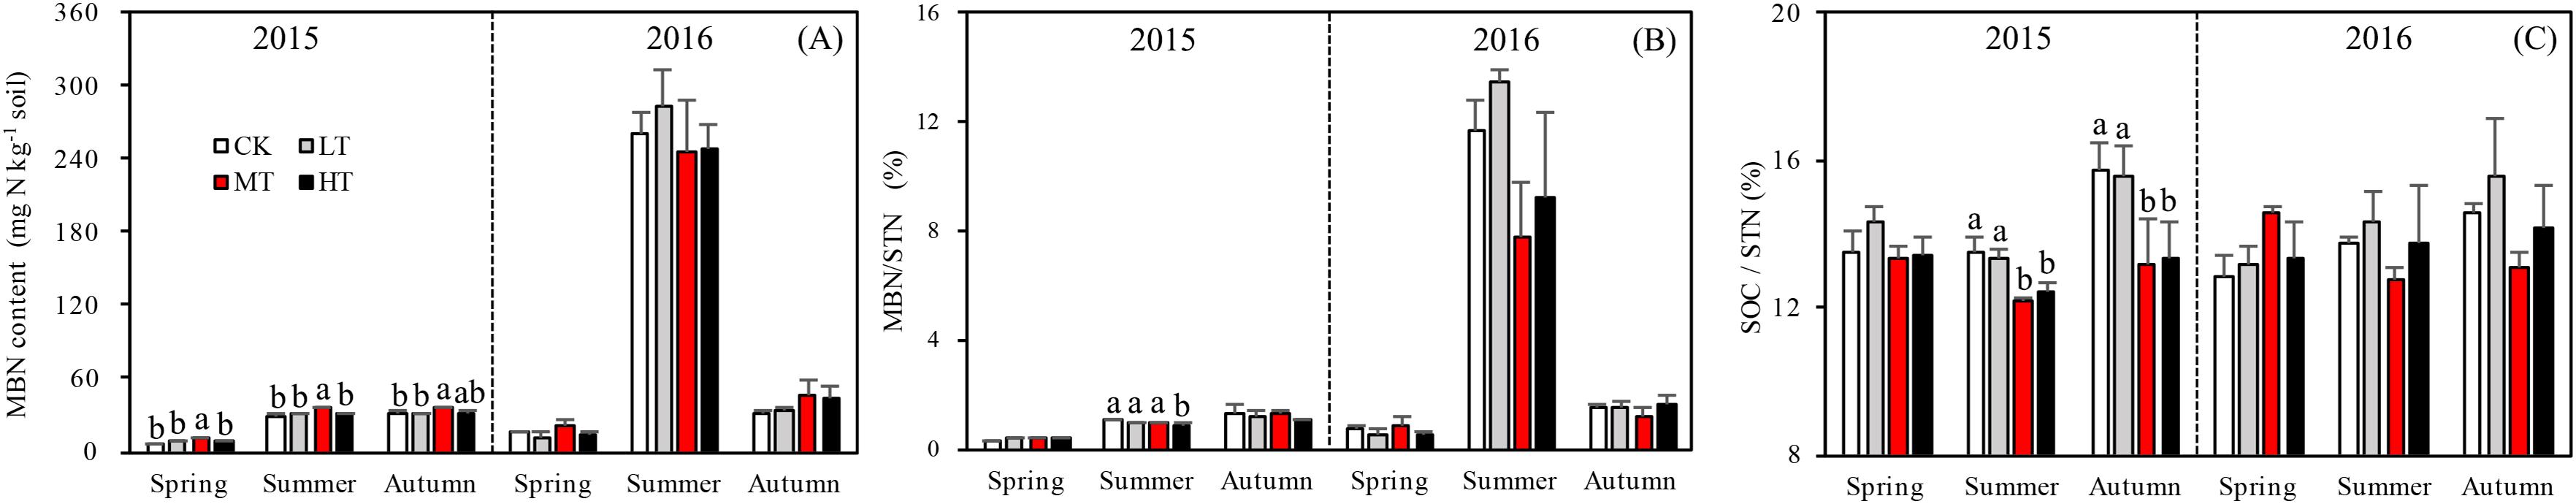 Dynamics of nitrogen and active nitrogen components across seasons